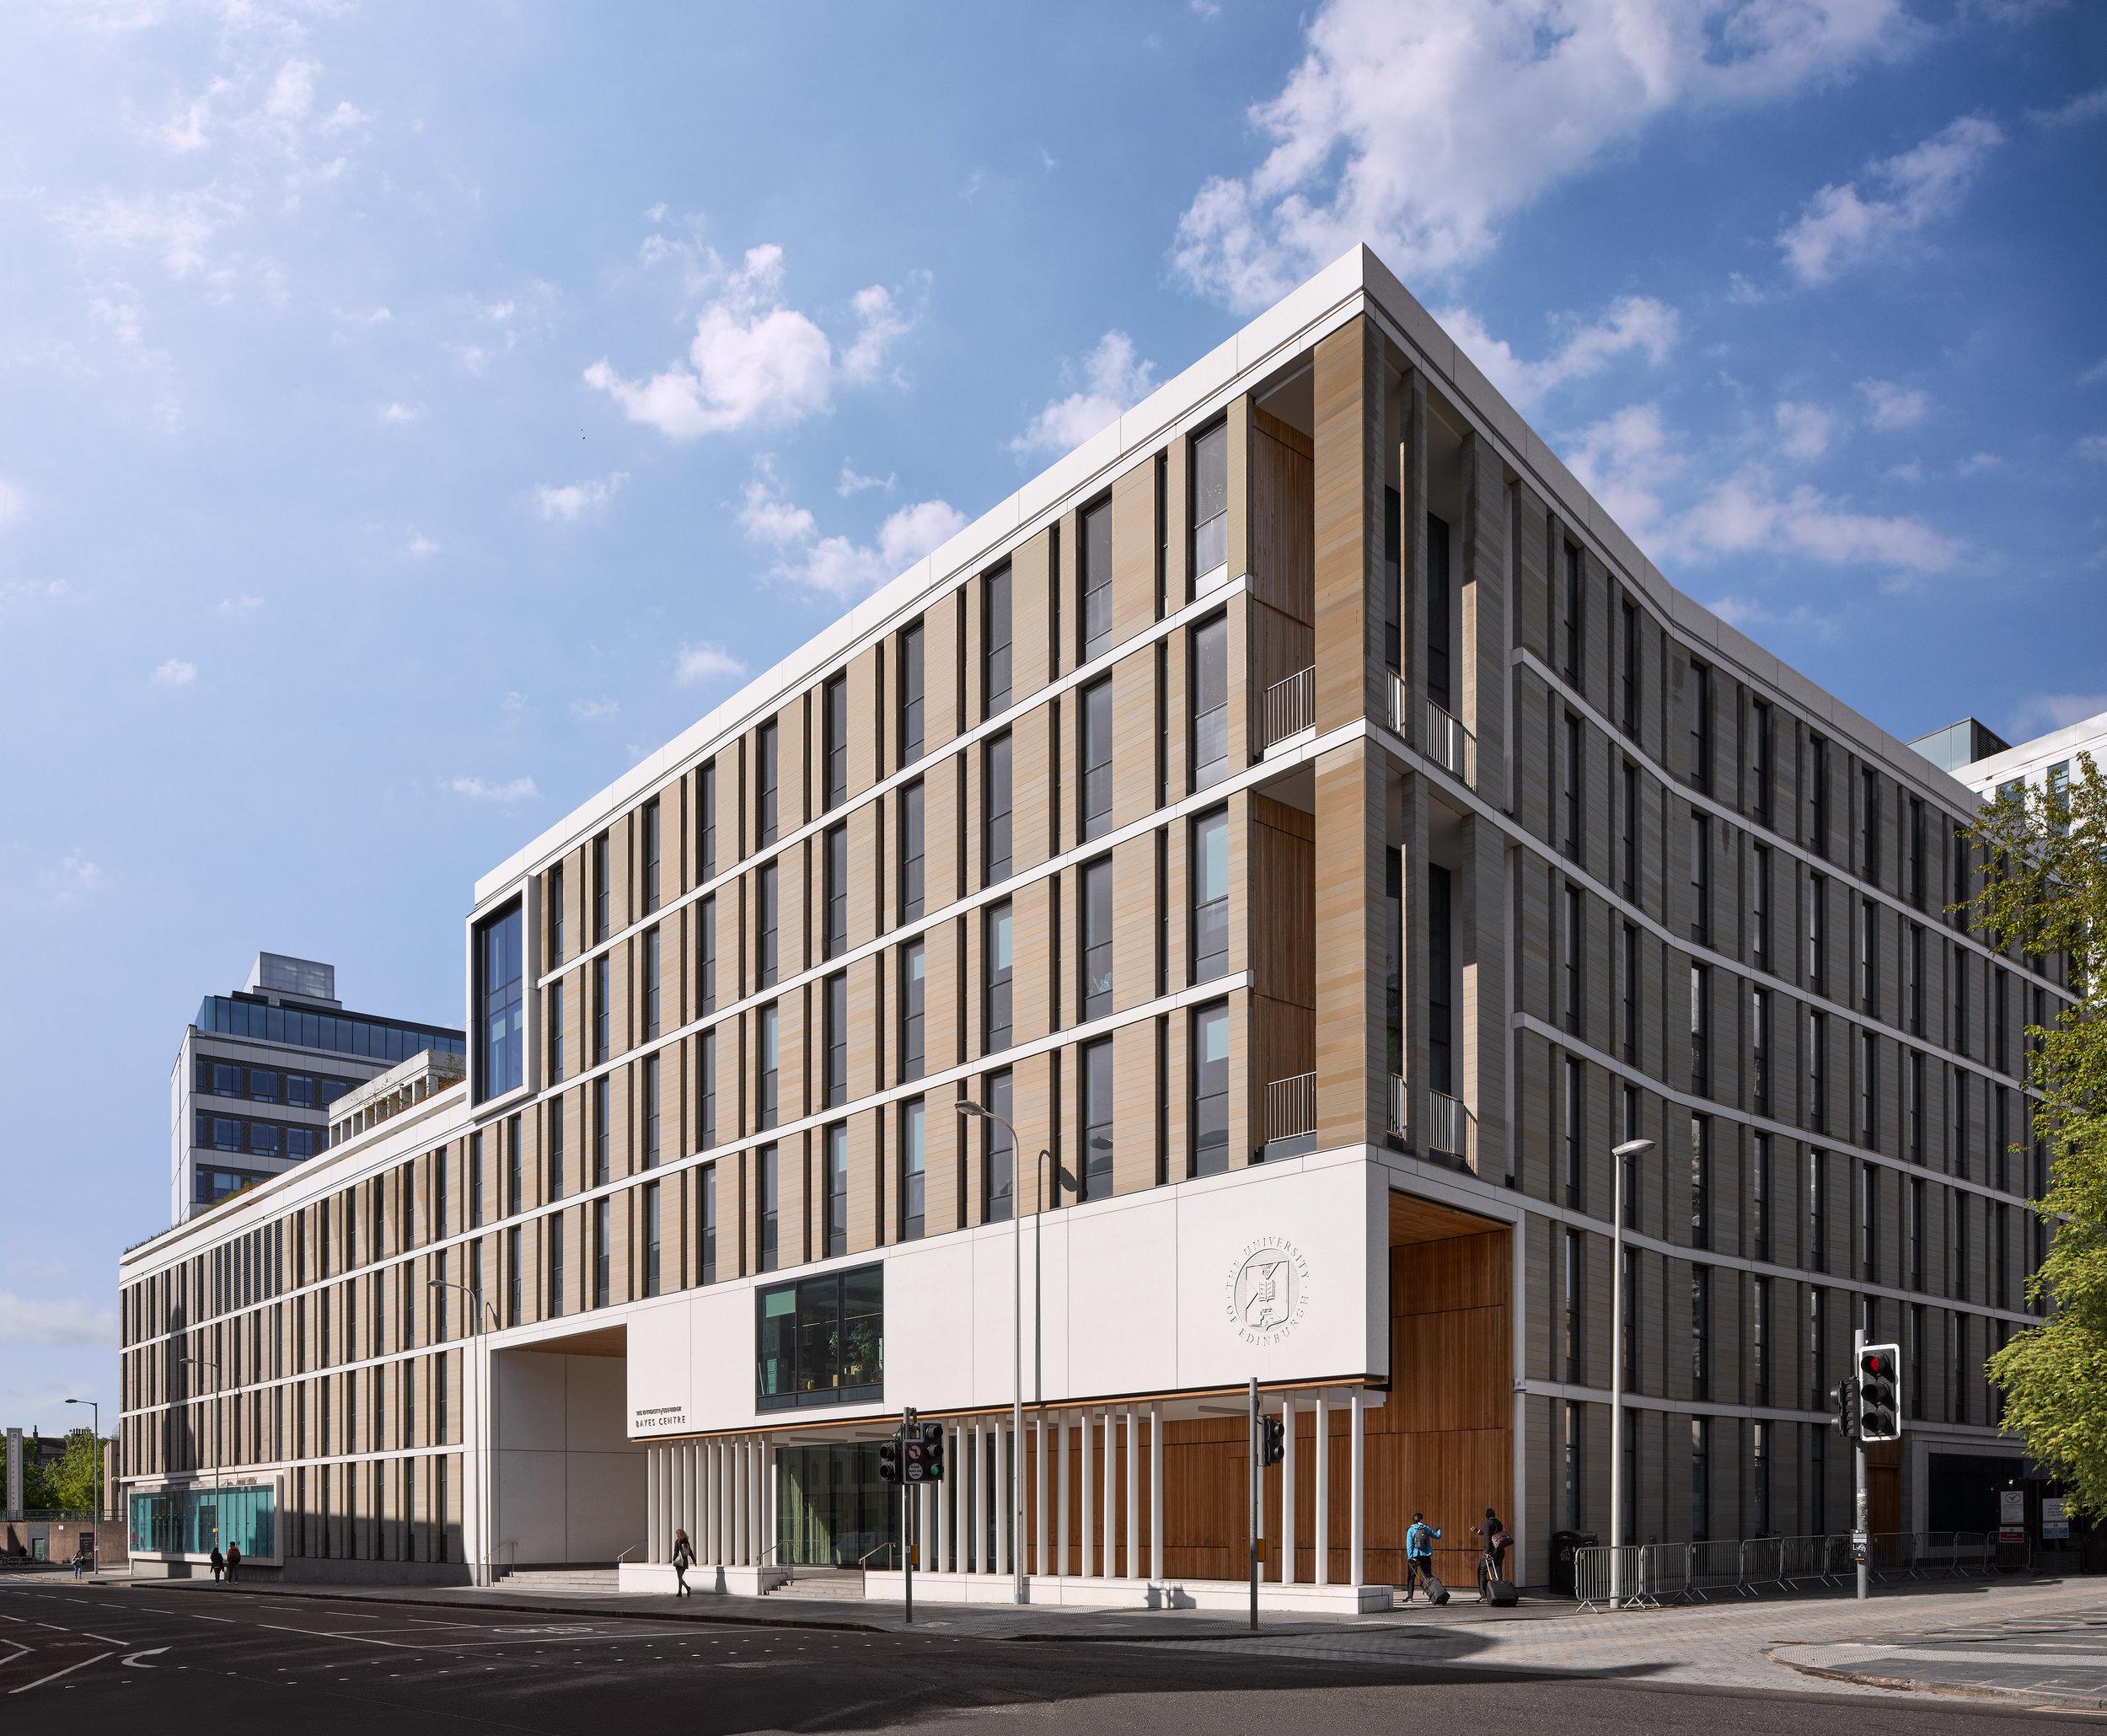 The Bays Centre at the University of Edinburgh: Edinburgh U.K.